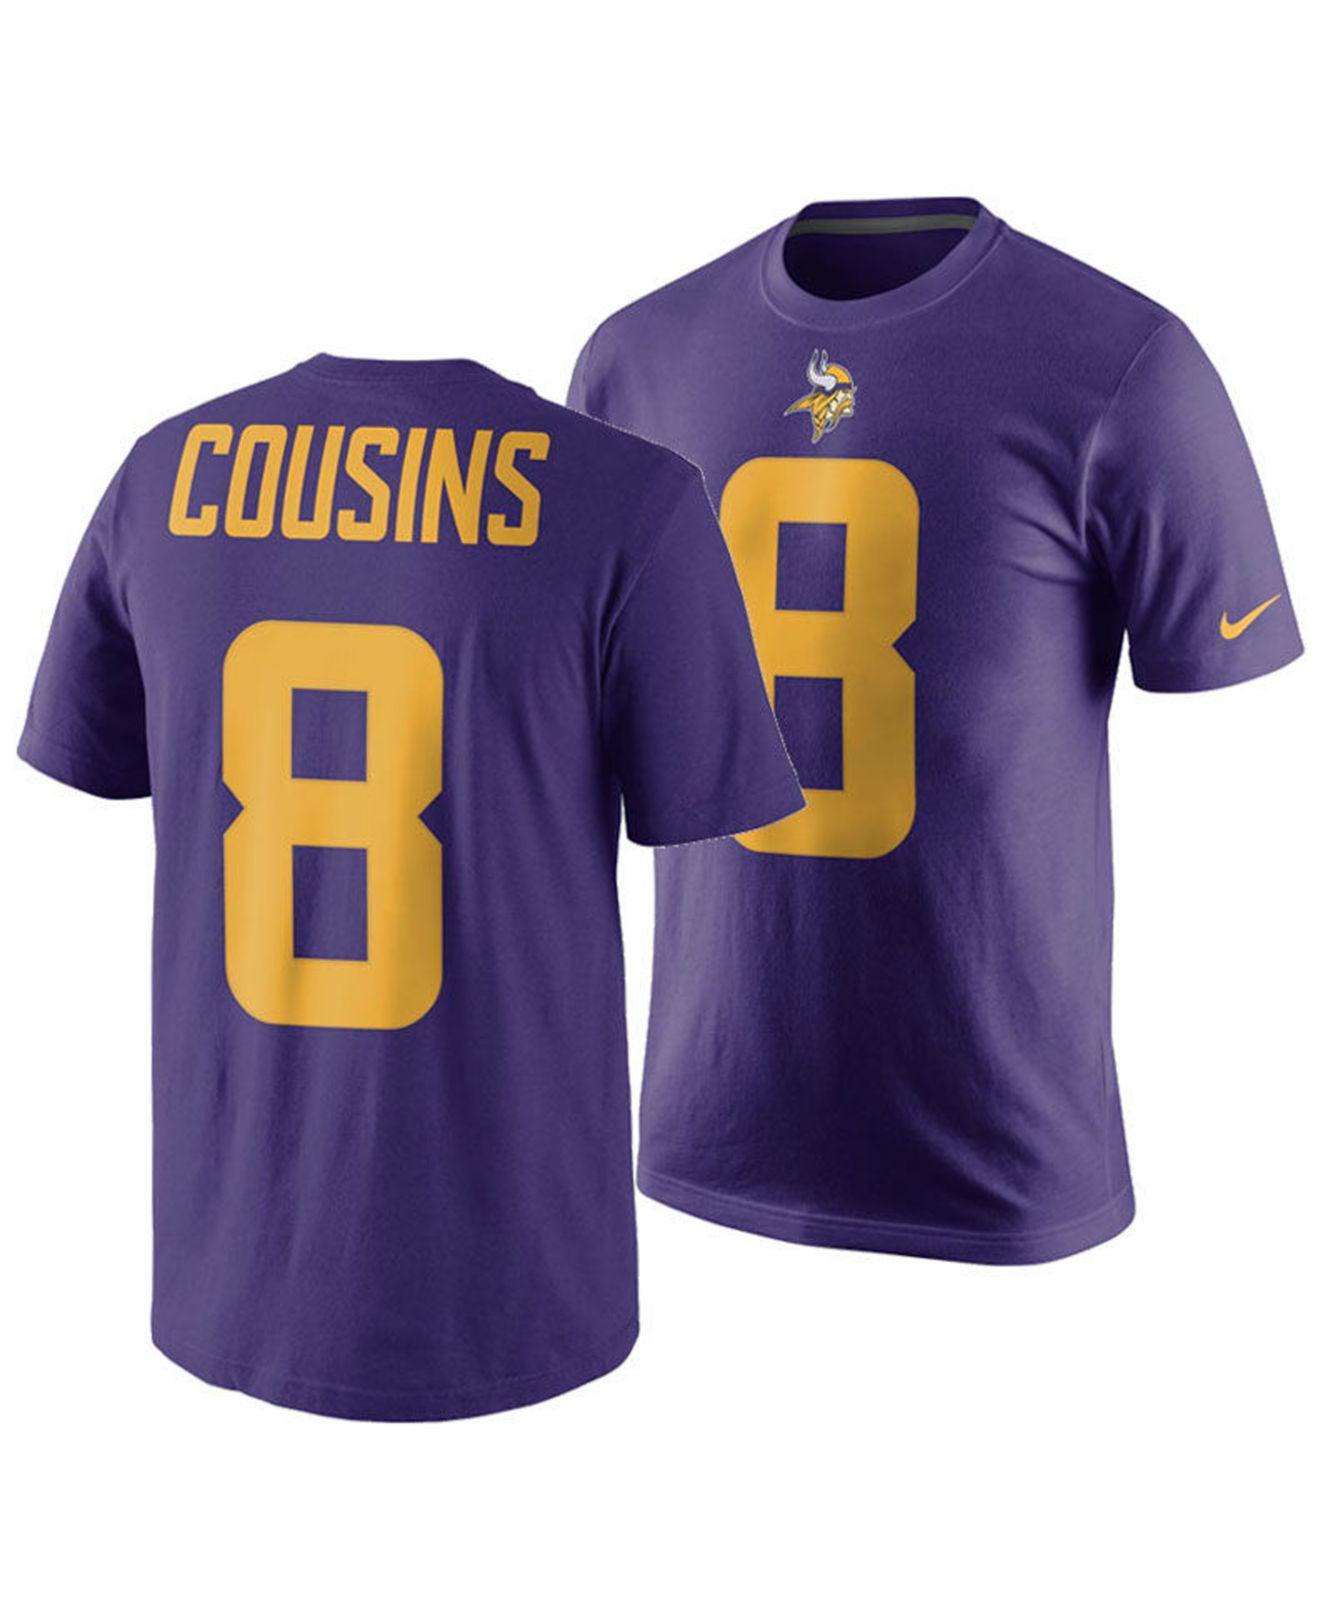 fba4f6811 Nike. Men s Purple Kirk Cousins Minnesota Vikings Pride Name And Number  Wordmark Color Rush T-shirt